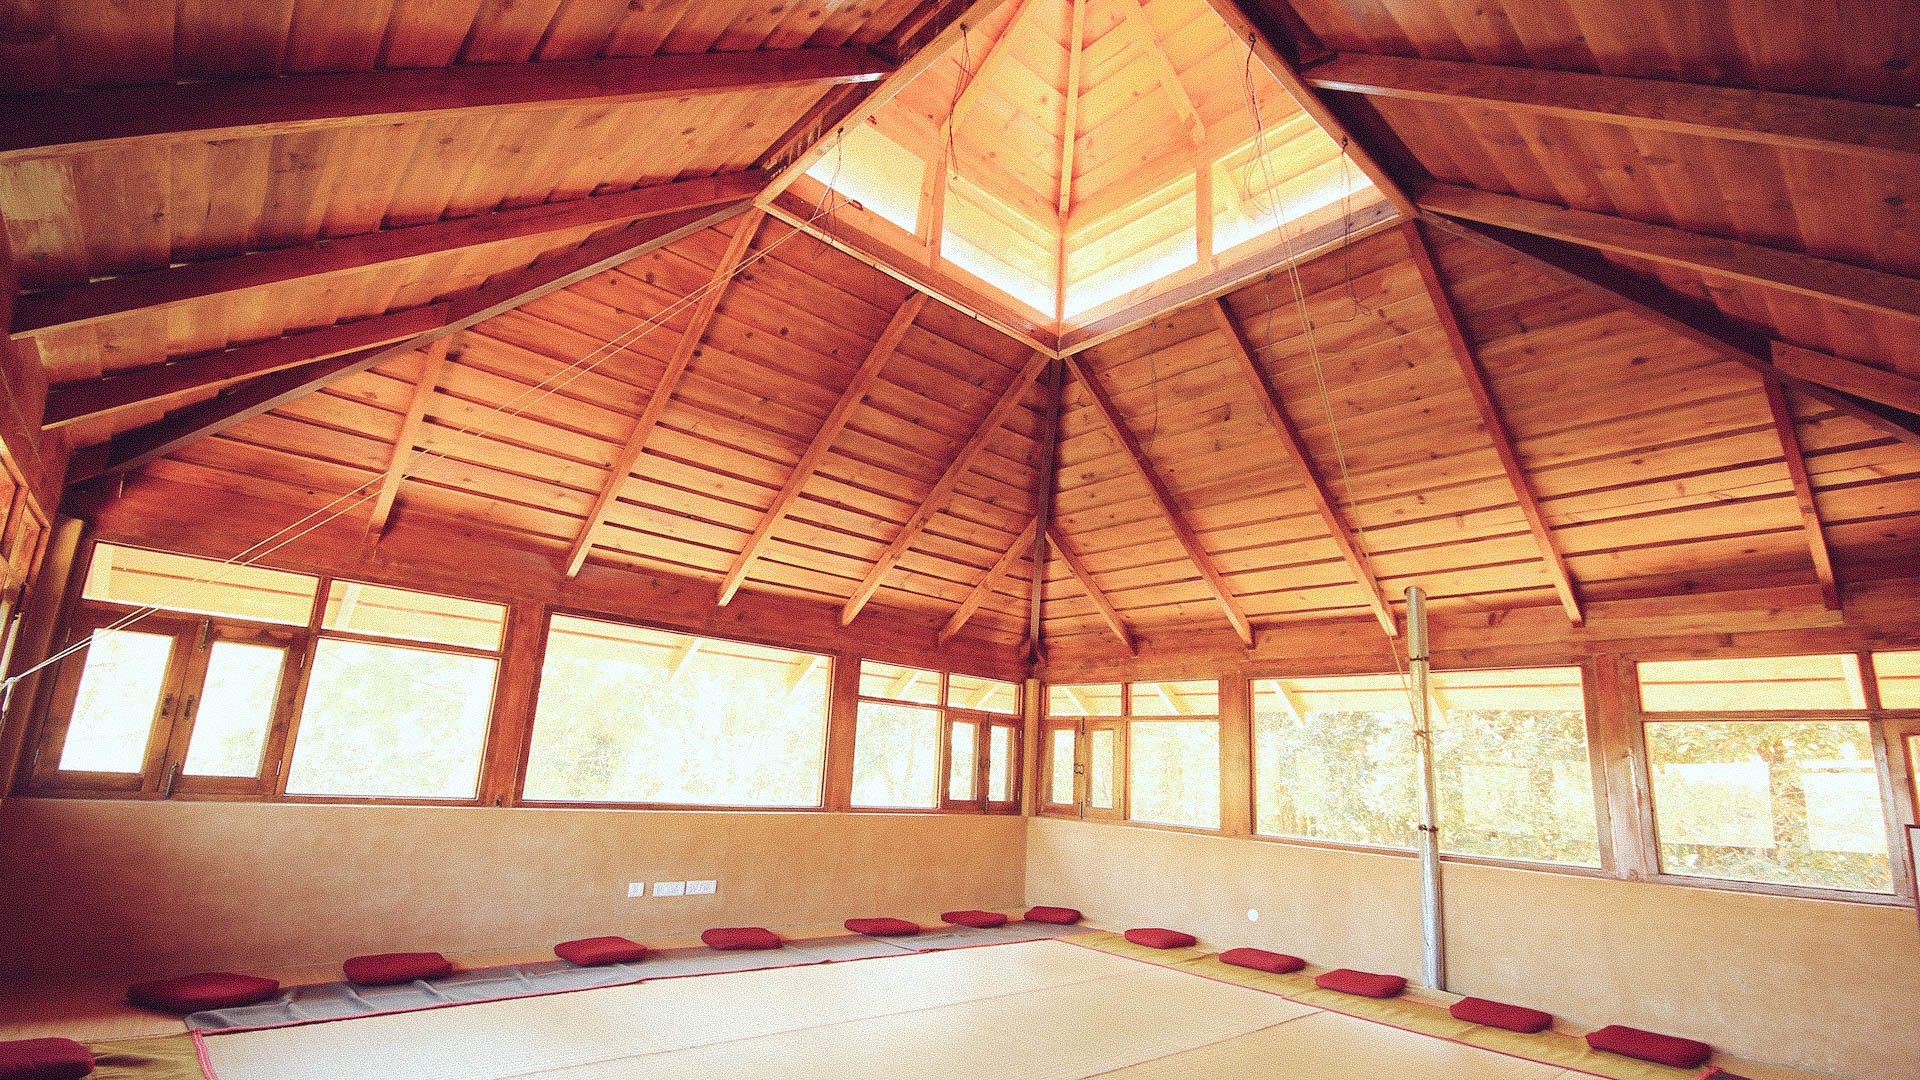 sadhana, swadhyay and yoga copy.jpg